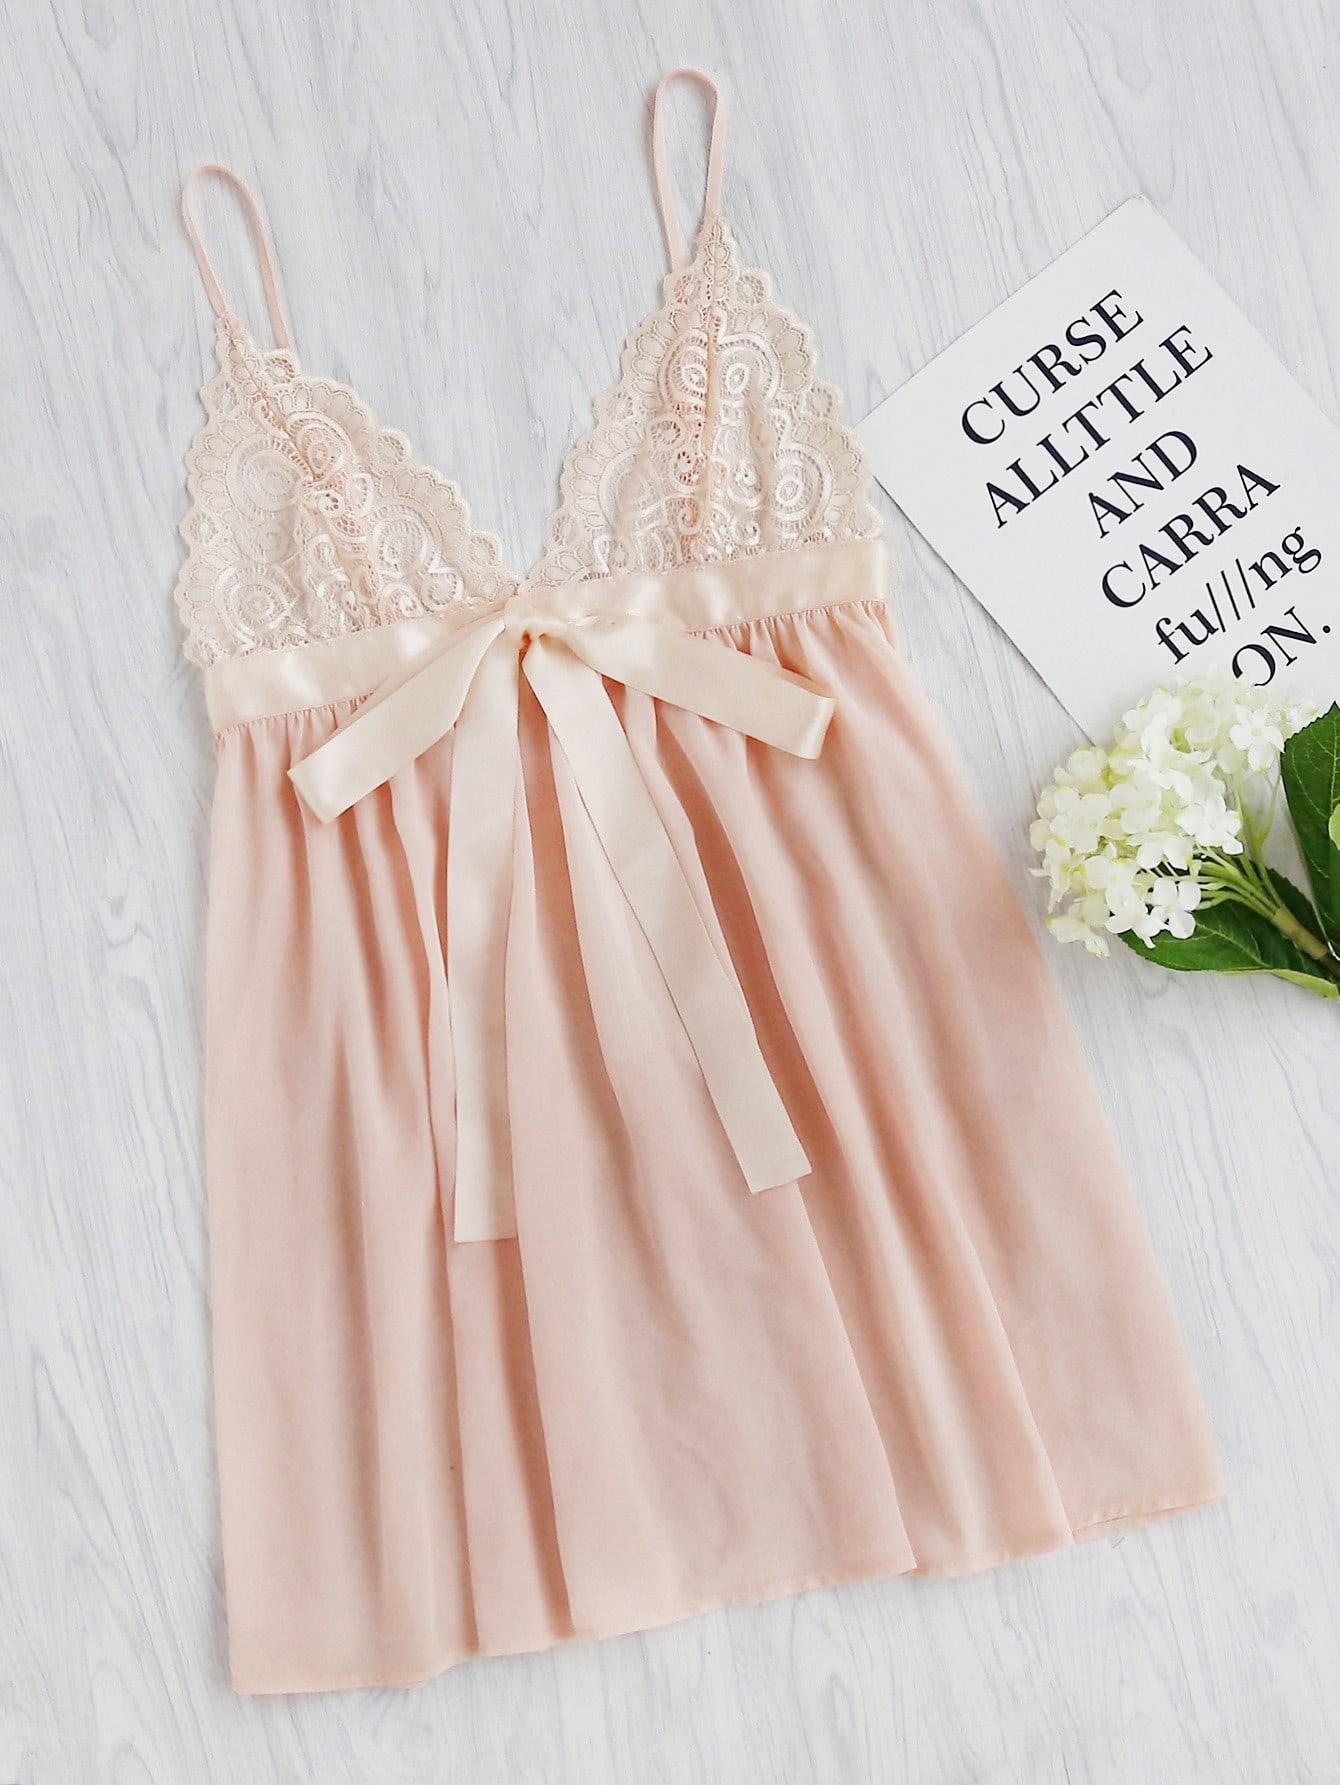 Lace Cup Sash Detail Babydoll Slip Dress lingerie170605704